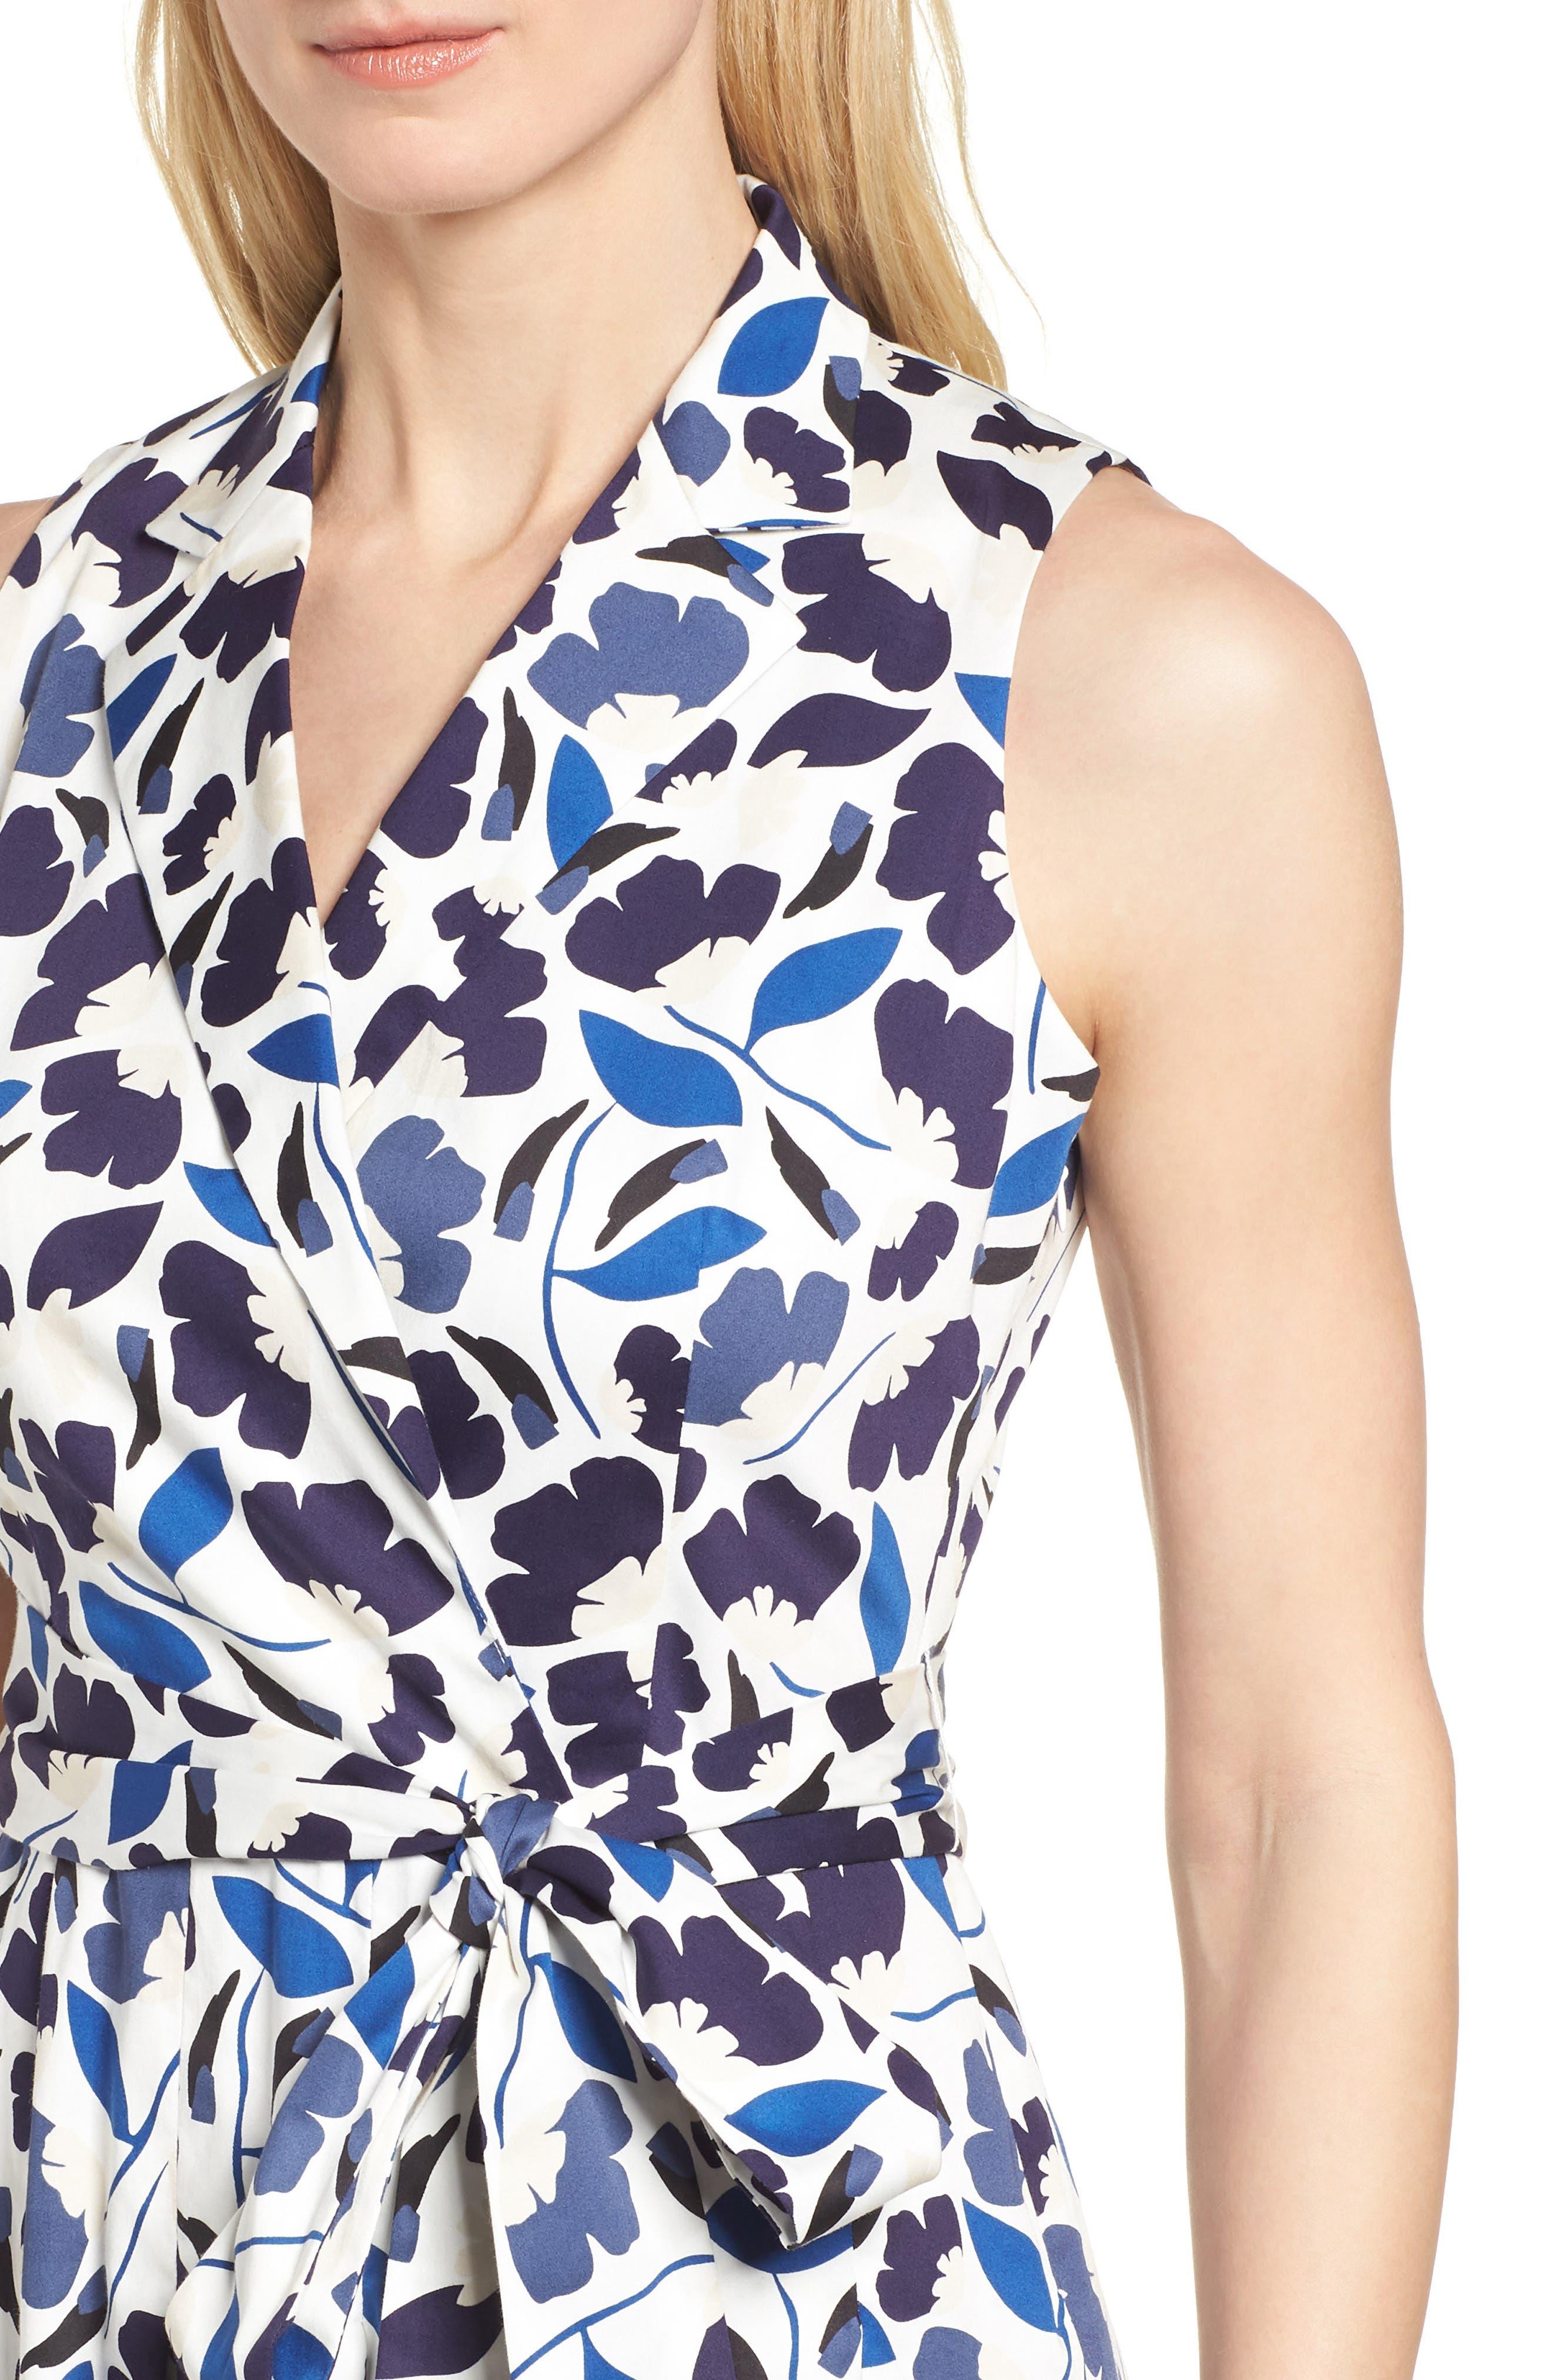 New York Humboldt Cotton Sateen Dress,                             Alternate thumbnail 4, color,                             Monaco Combo